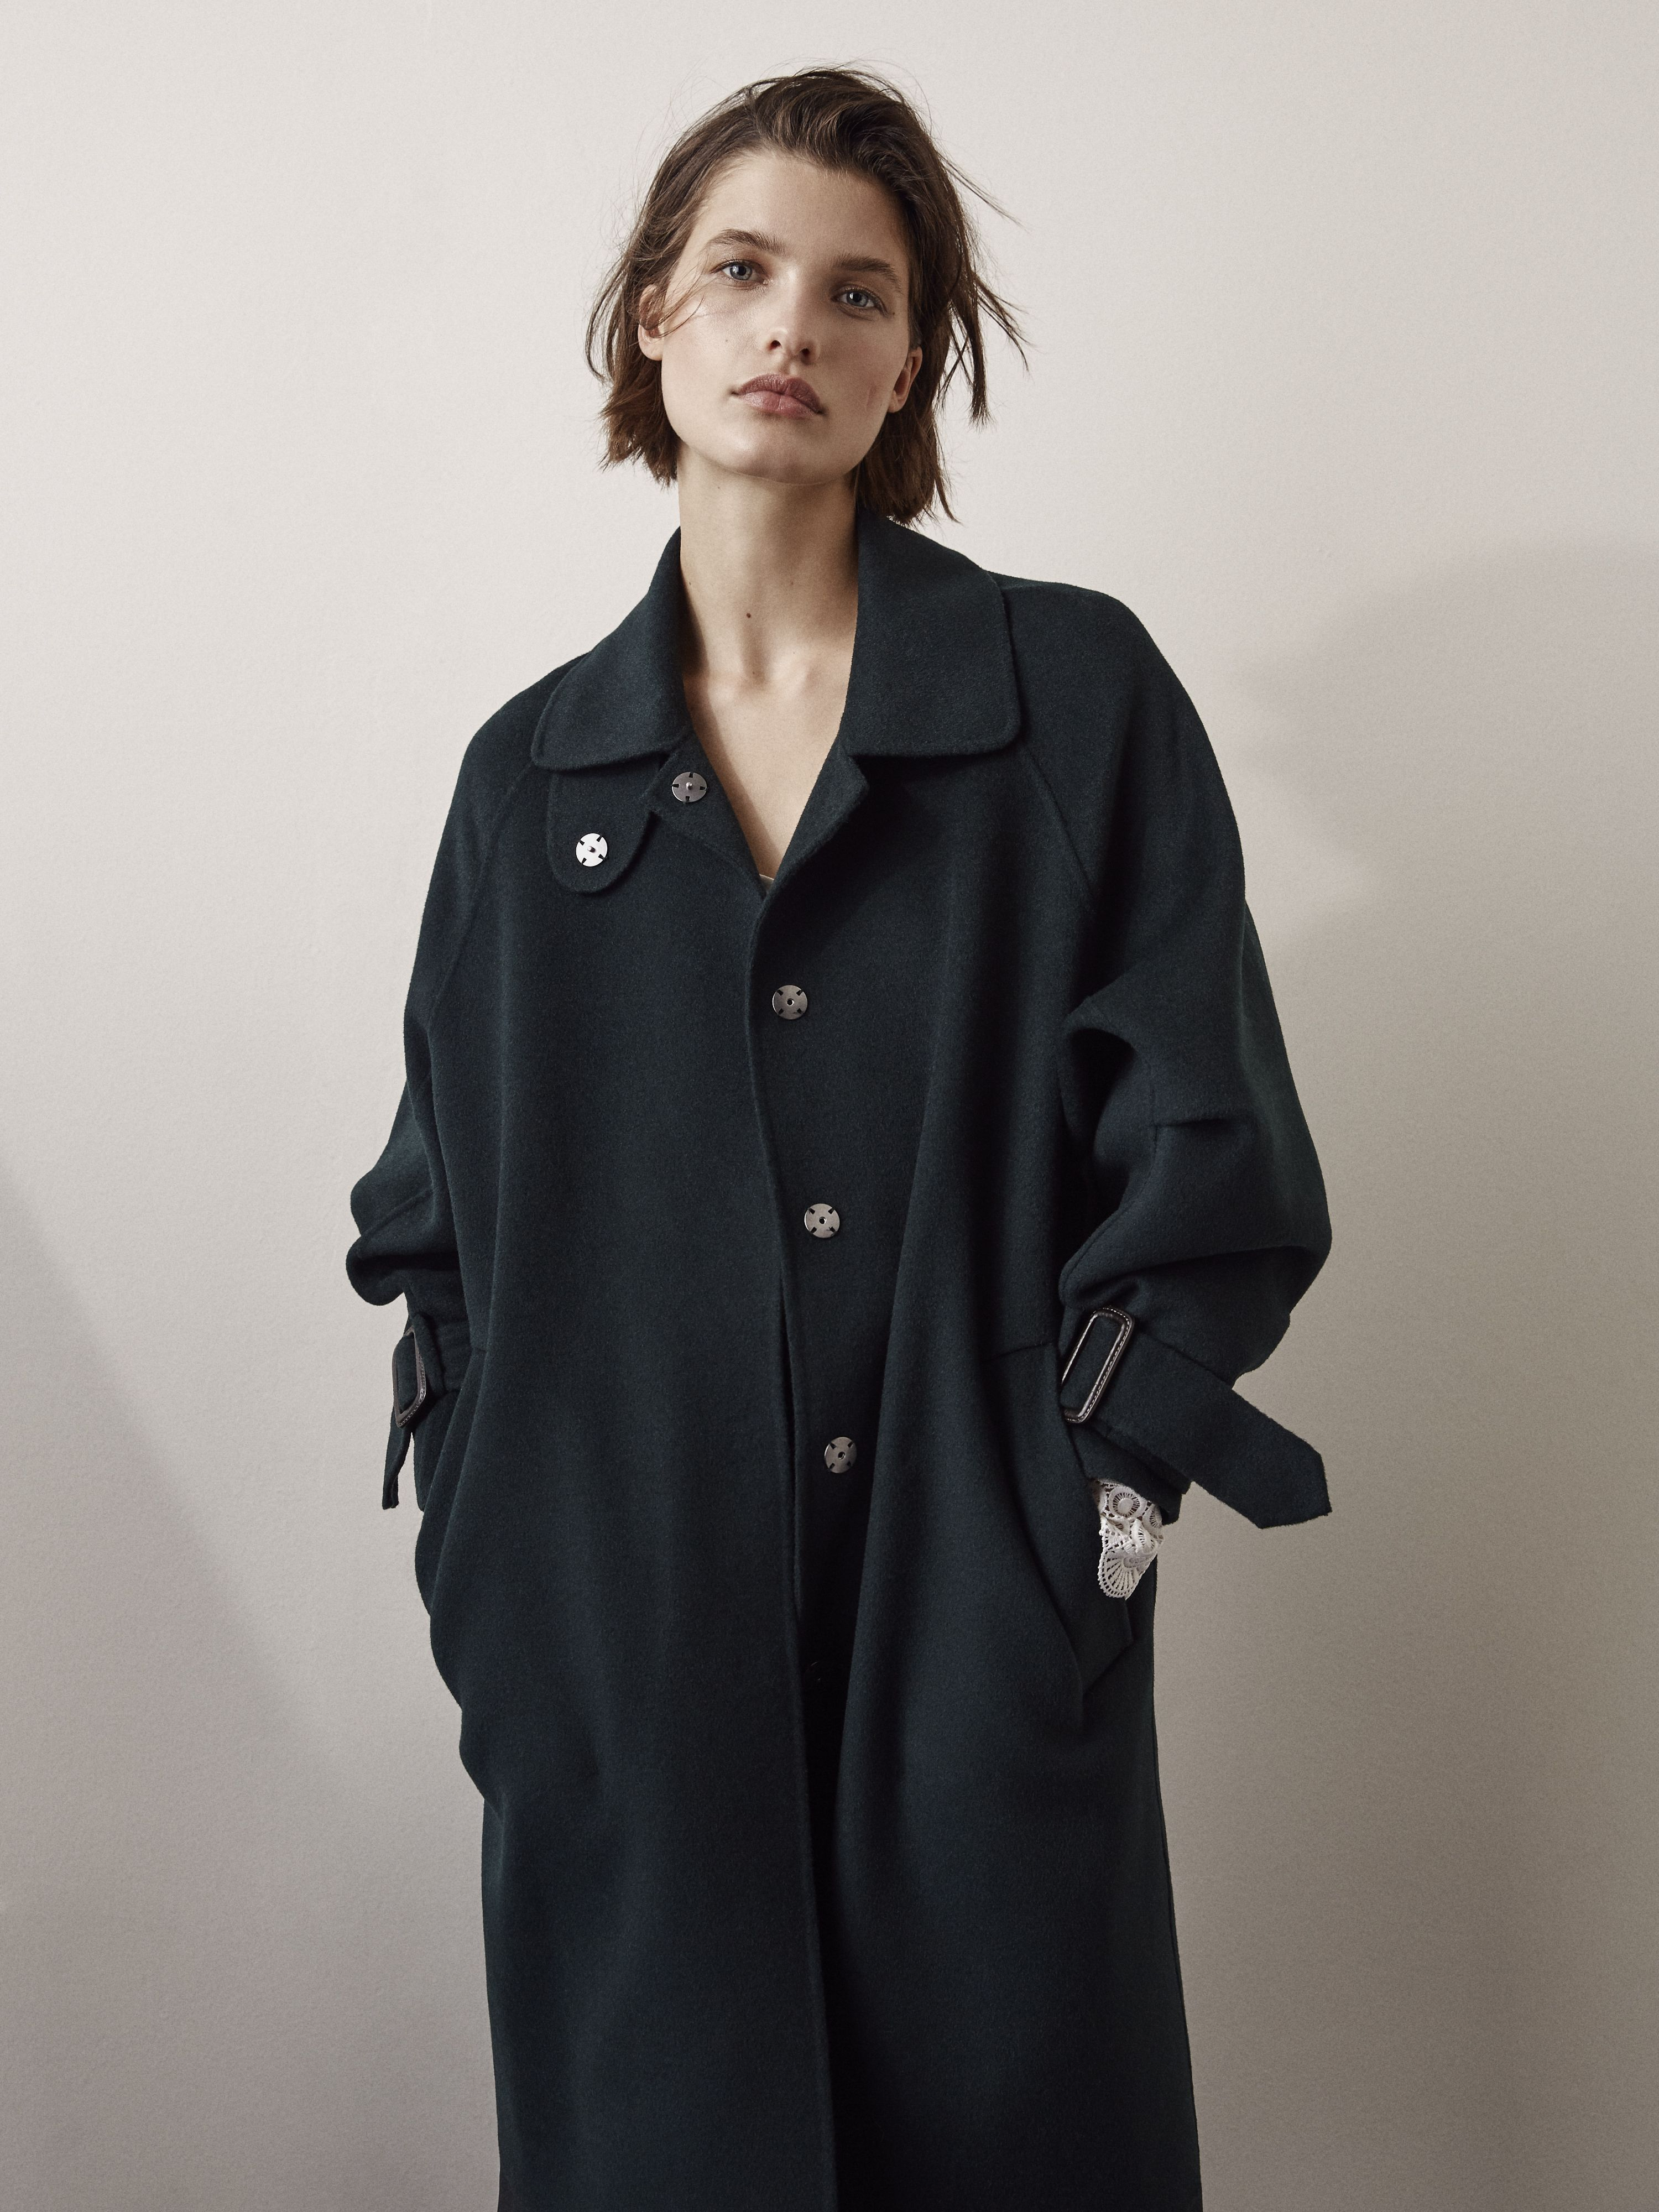 EDITORIAL - Contemporary Nature en Massimo Dutti online. Entre ahora y descubra nuestra colección d…   Womens fashion photography. Runway fashion